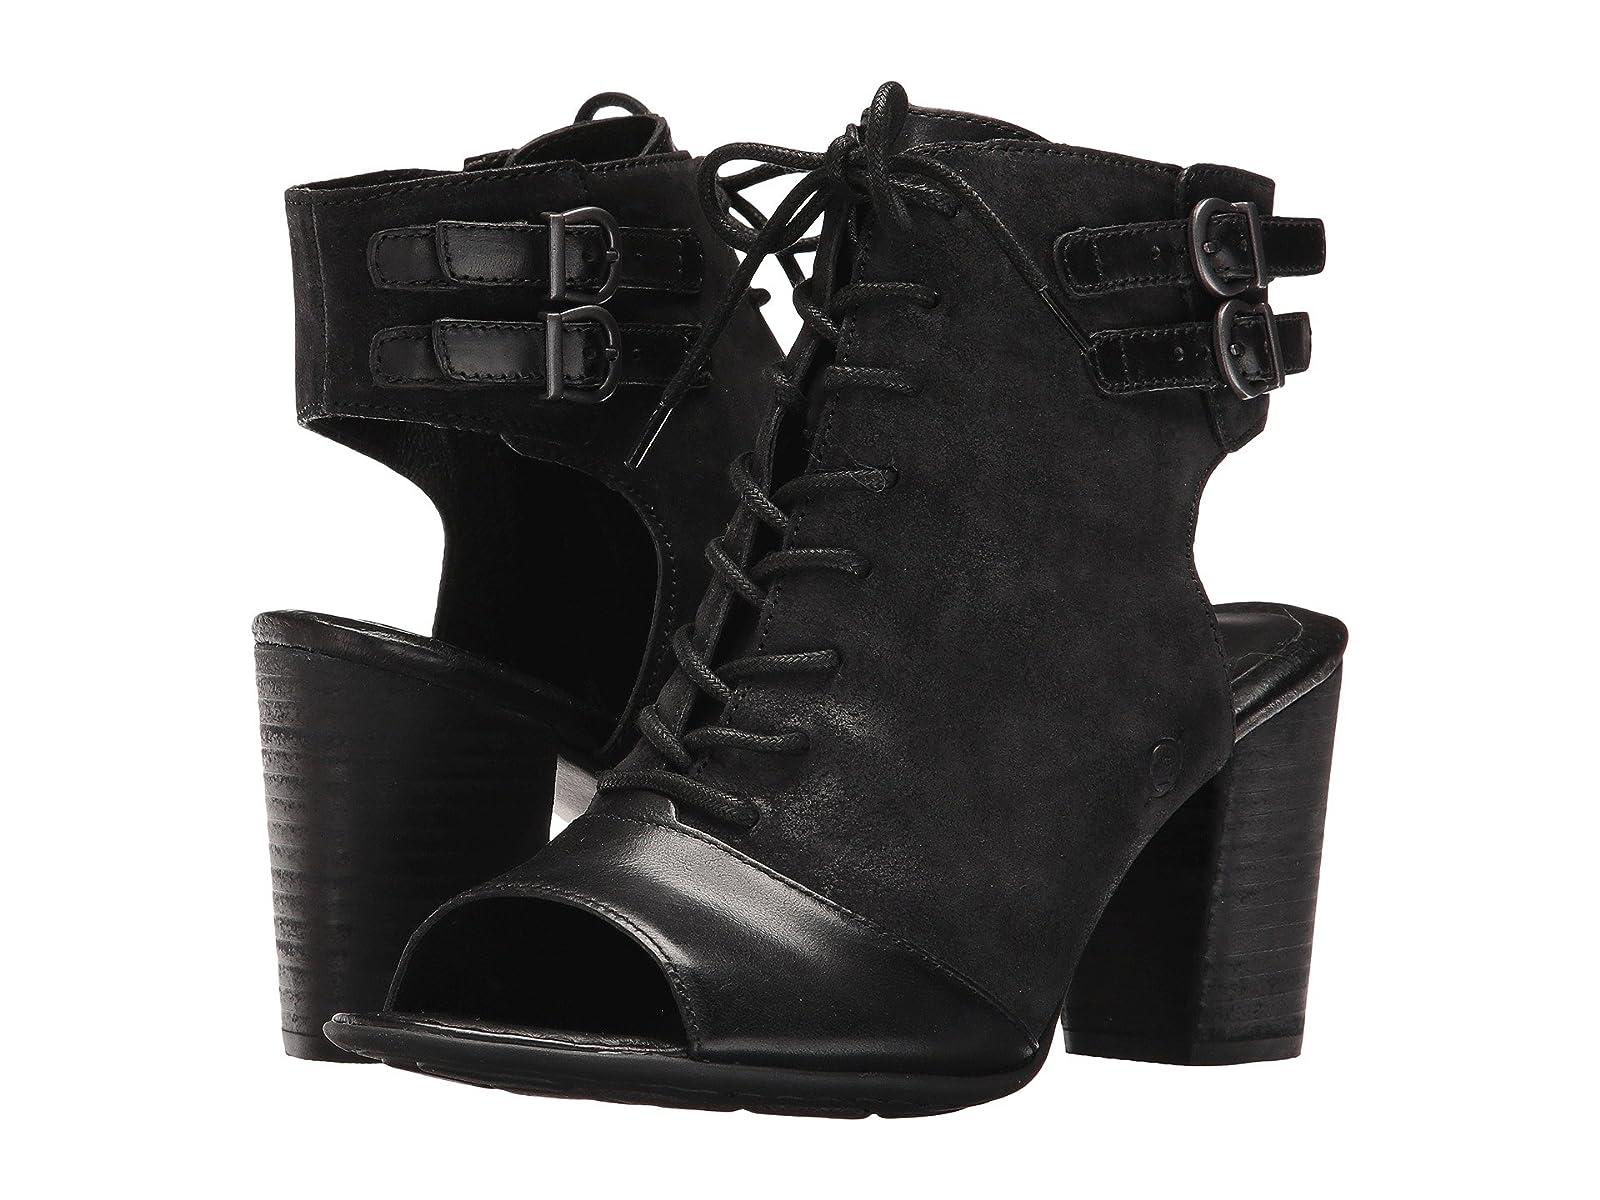 Born BlaneCheap and distinctive eye-catching shoes